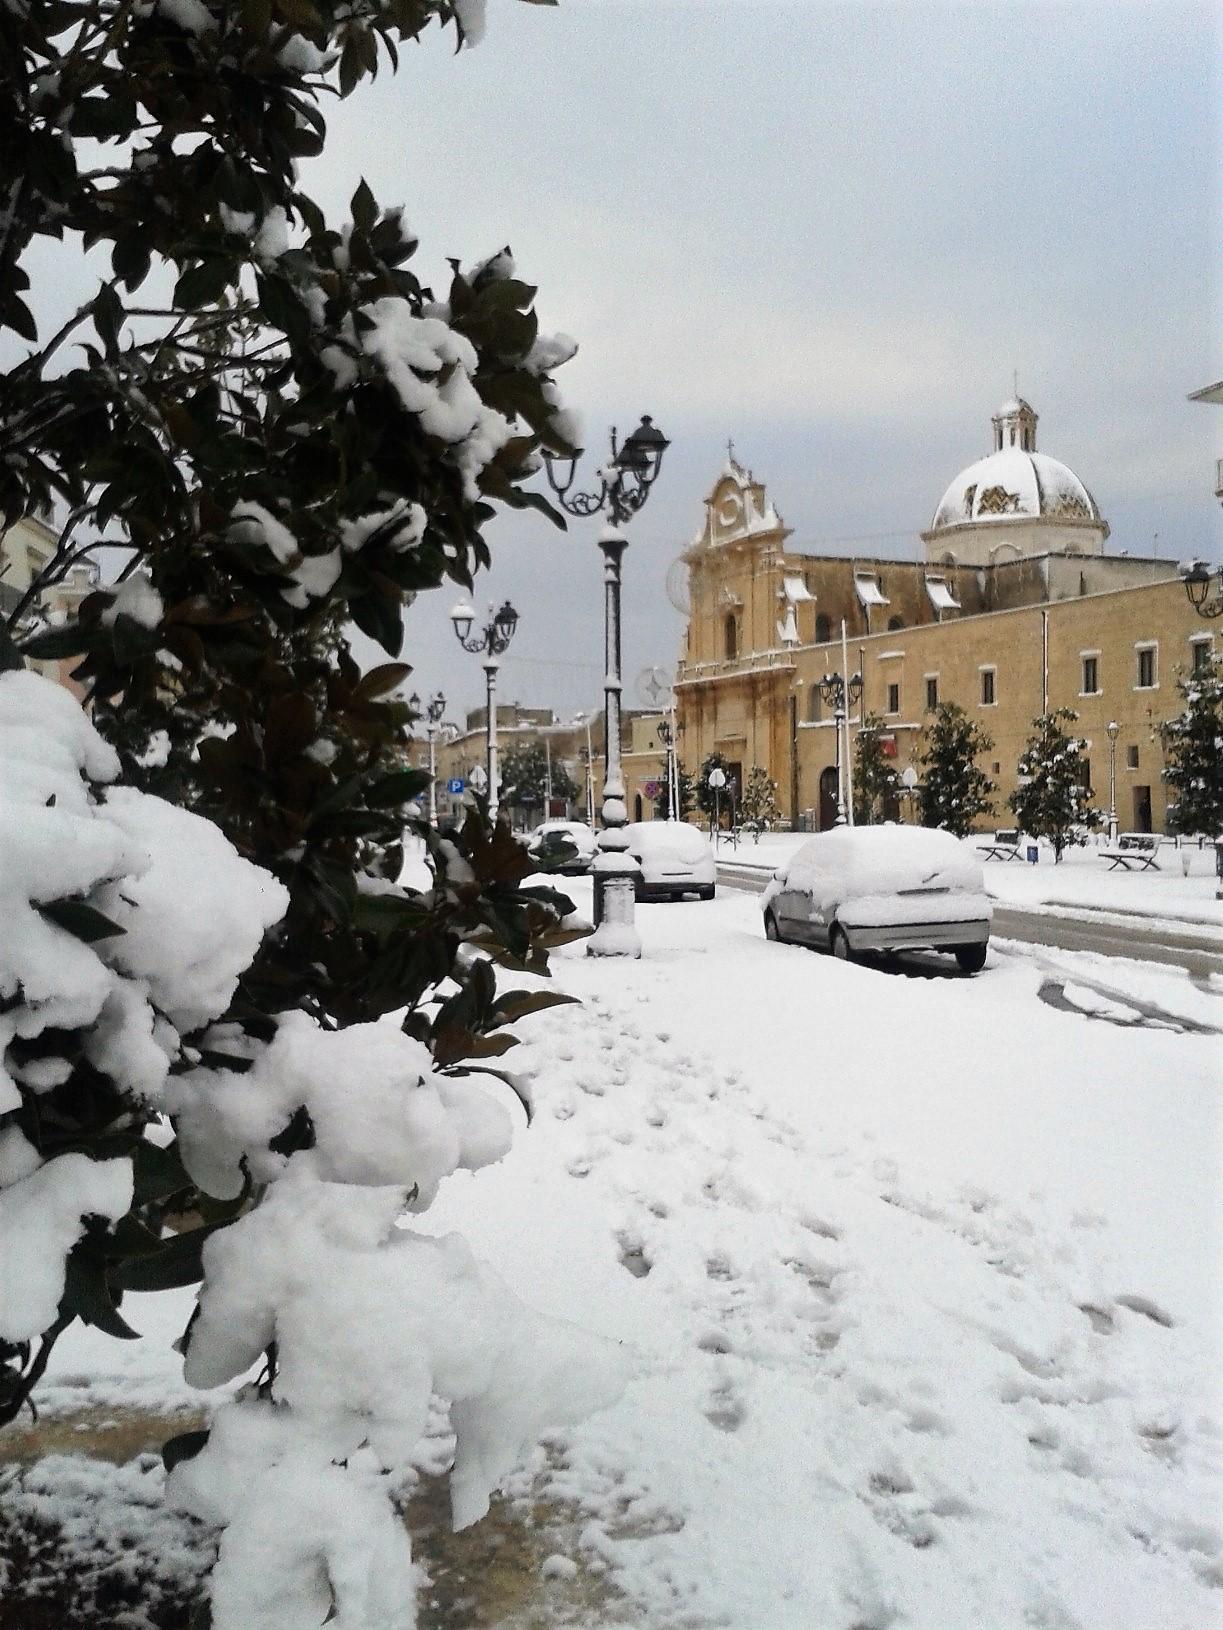 Galleria fotografica neve 03-04 gennaio 2019-wp_000338.jpg